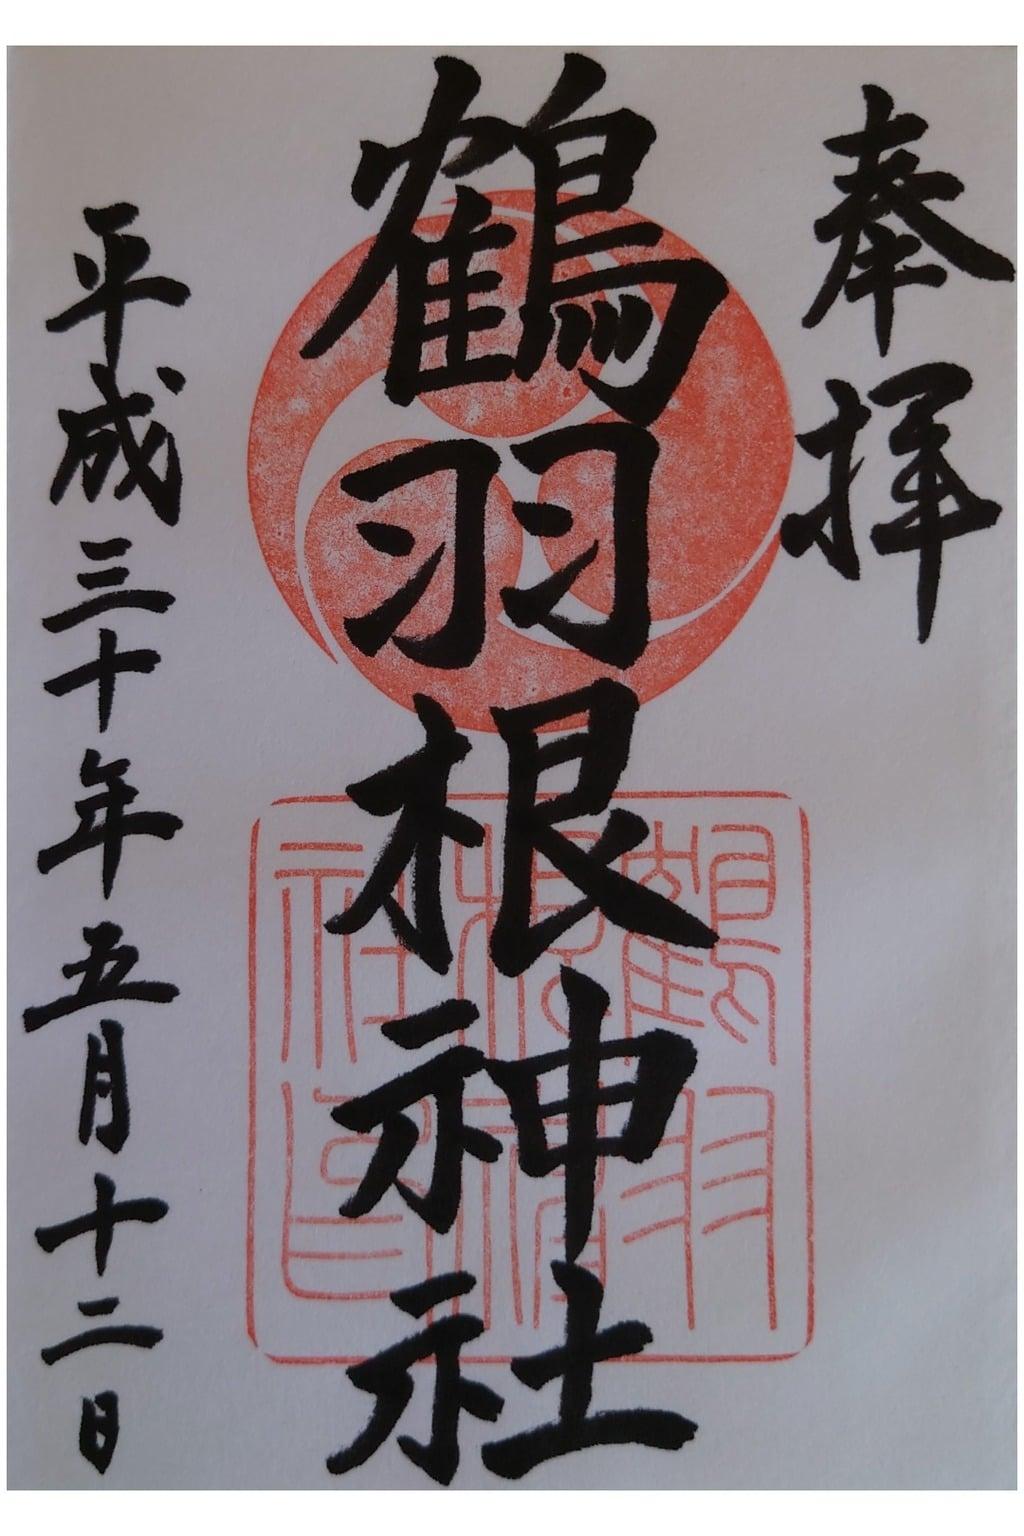 鶴羽根神社の御朱印